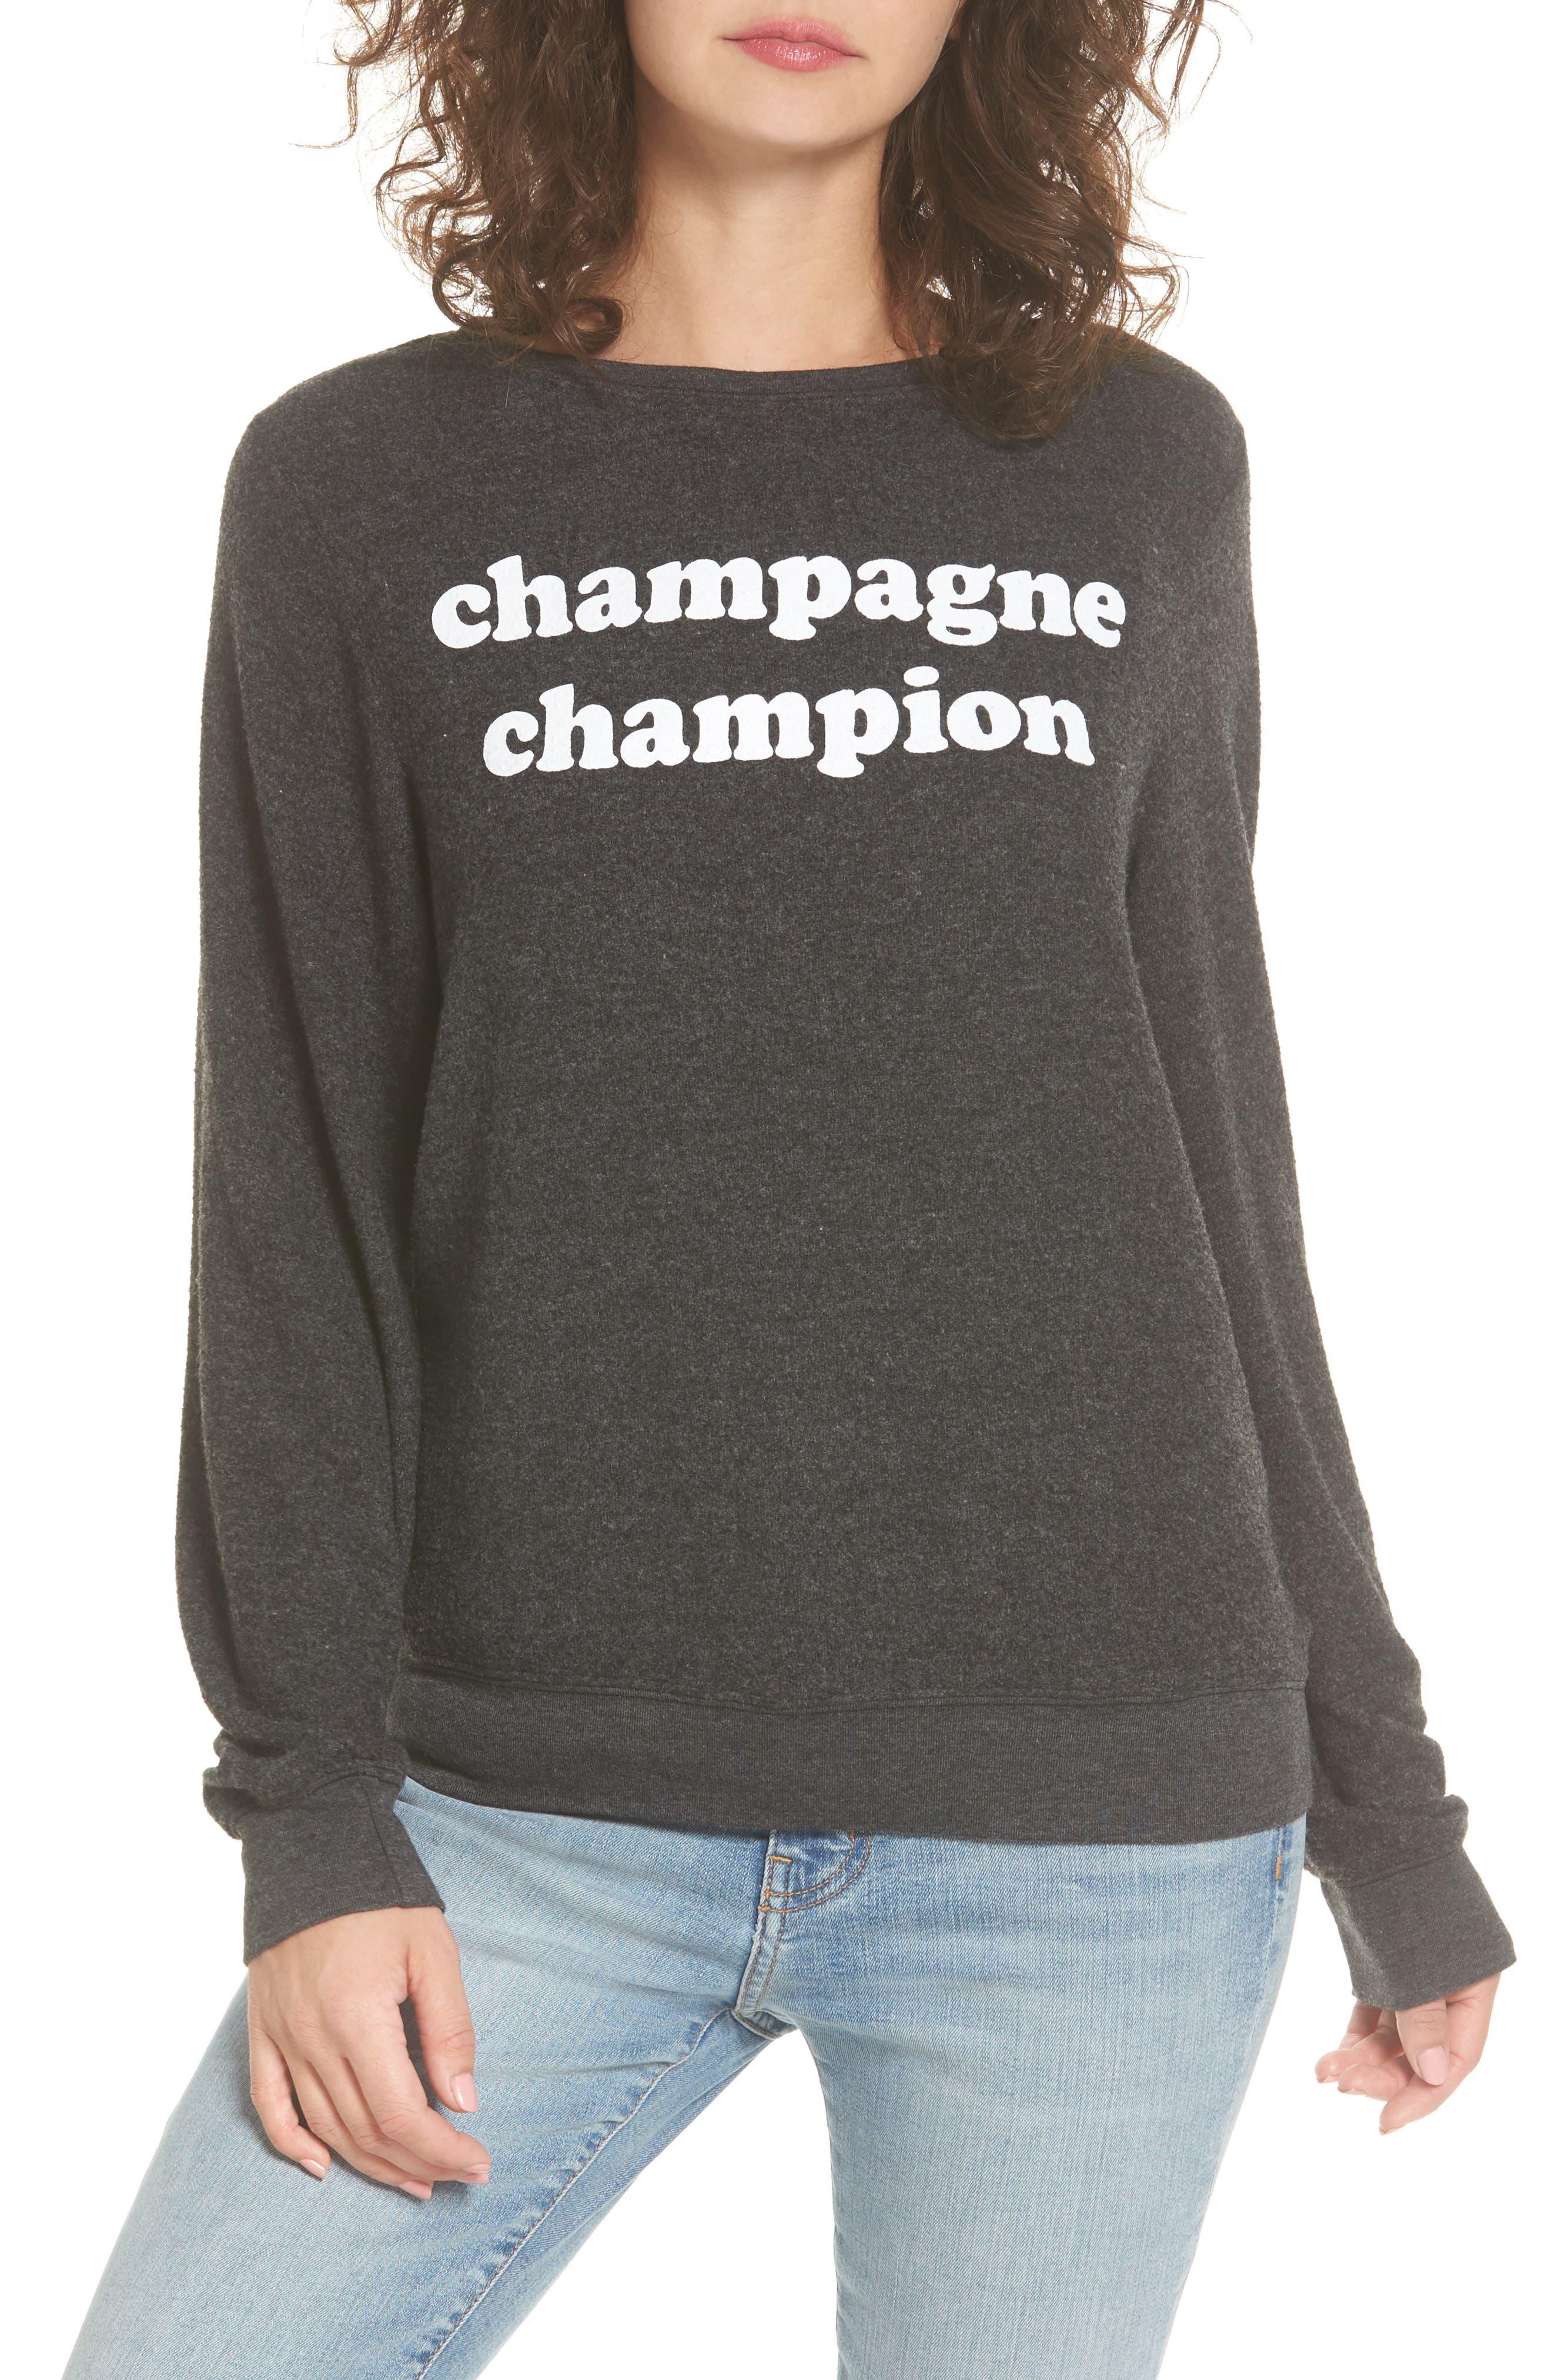 Champagne Champion Sweatshirt,                             Main thumbnail 1, color,                             001